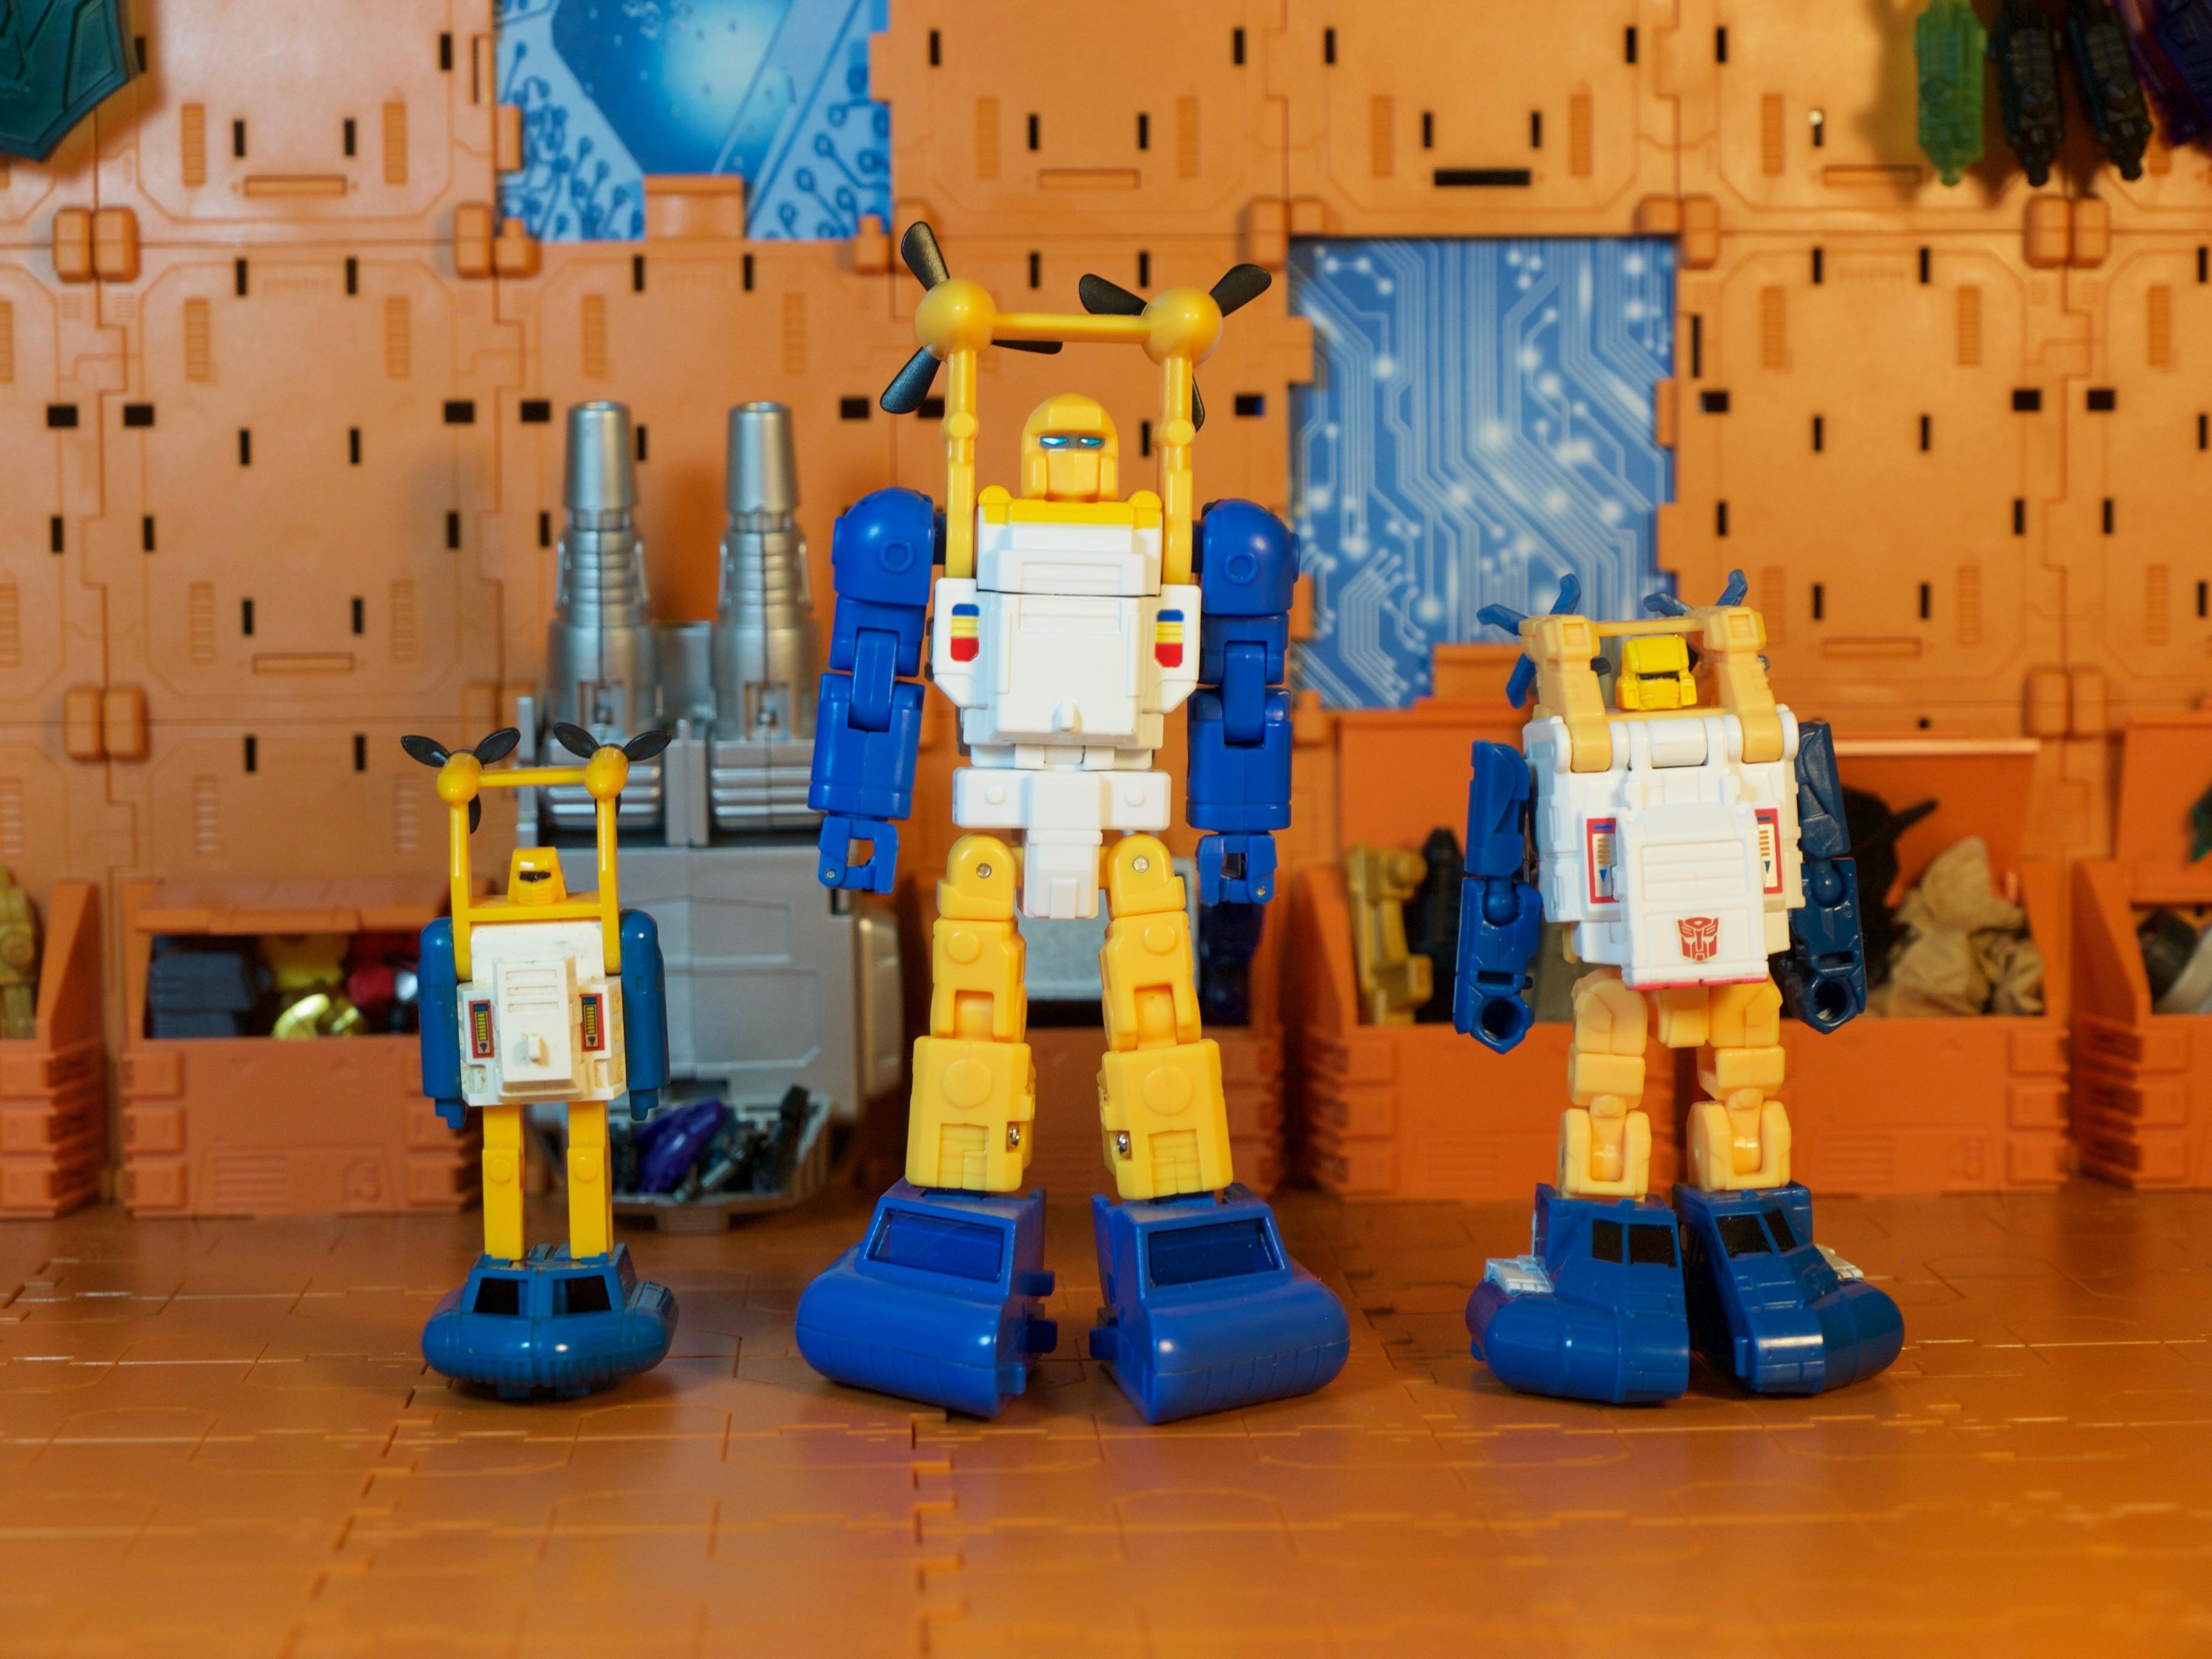 Spindrift robot comparison